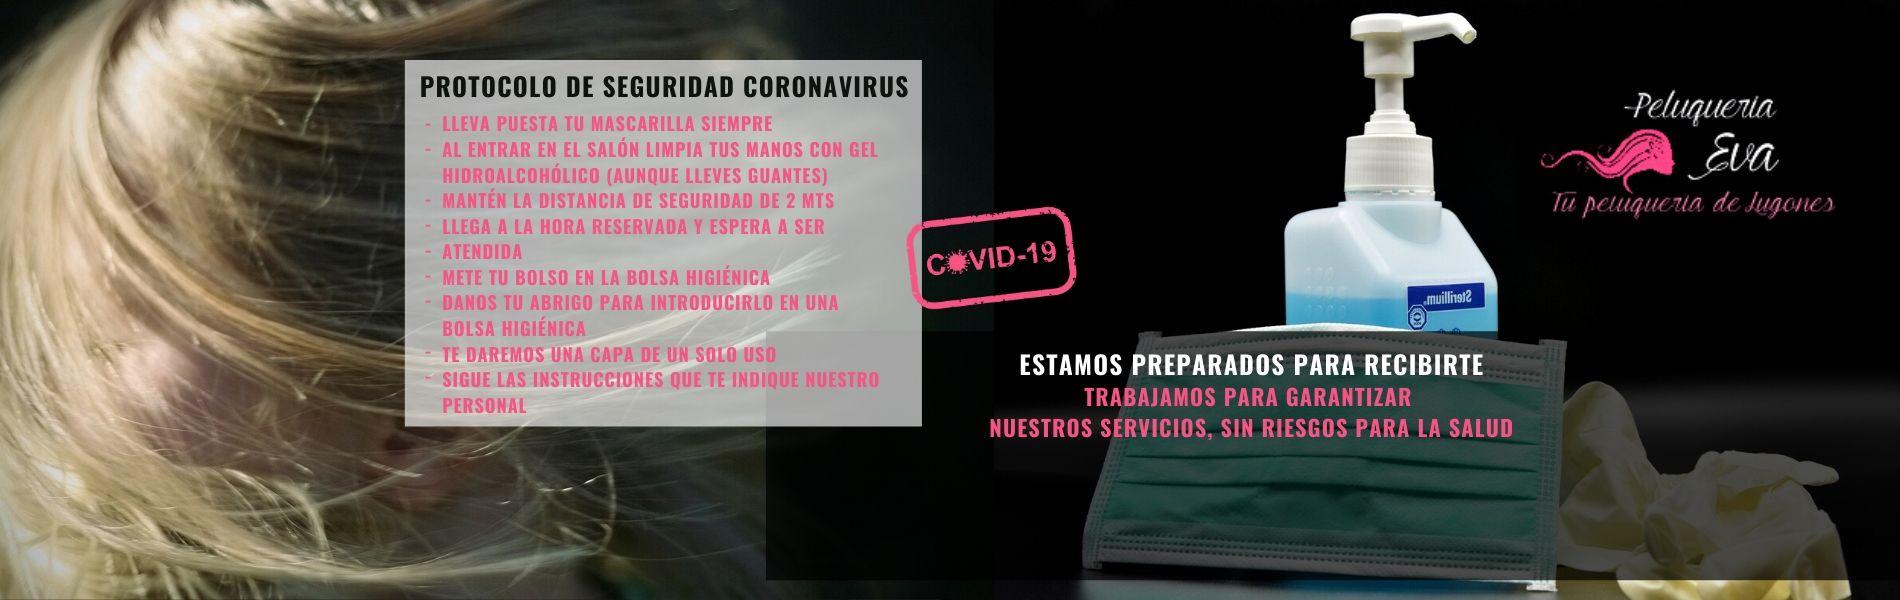 protocolo-coronavirus